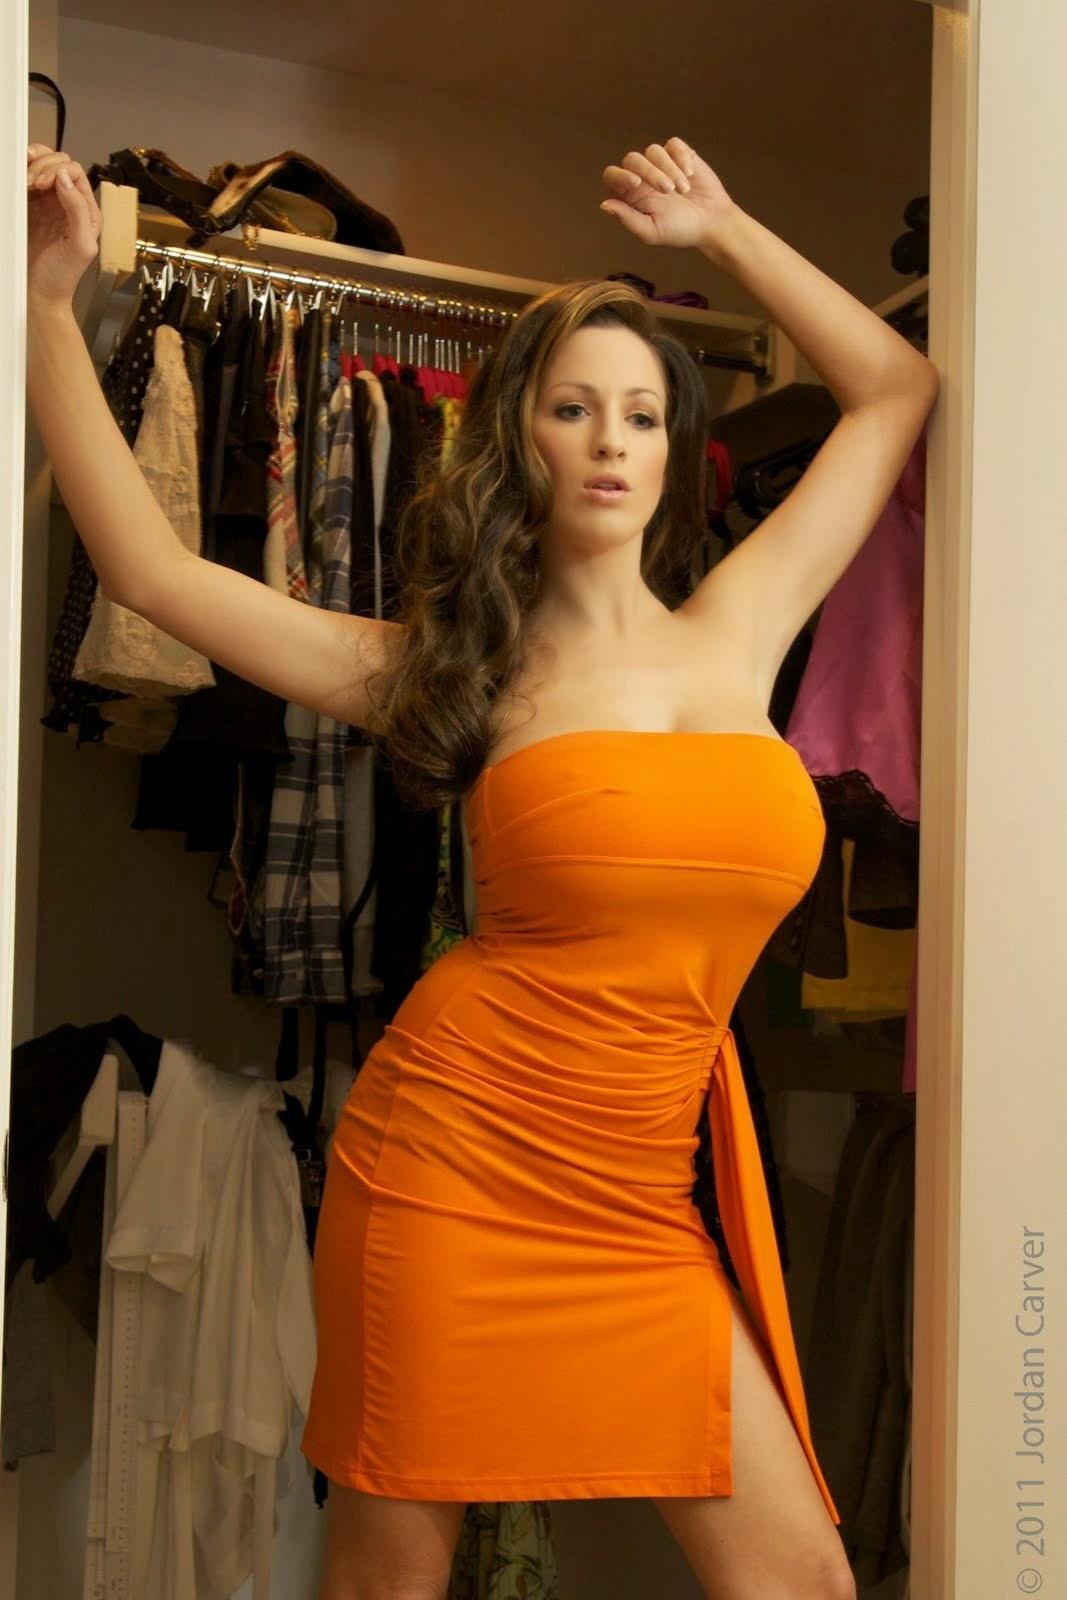 Jordan Carver Big Boobs show in Wardrobe picking Costumes